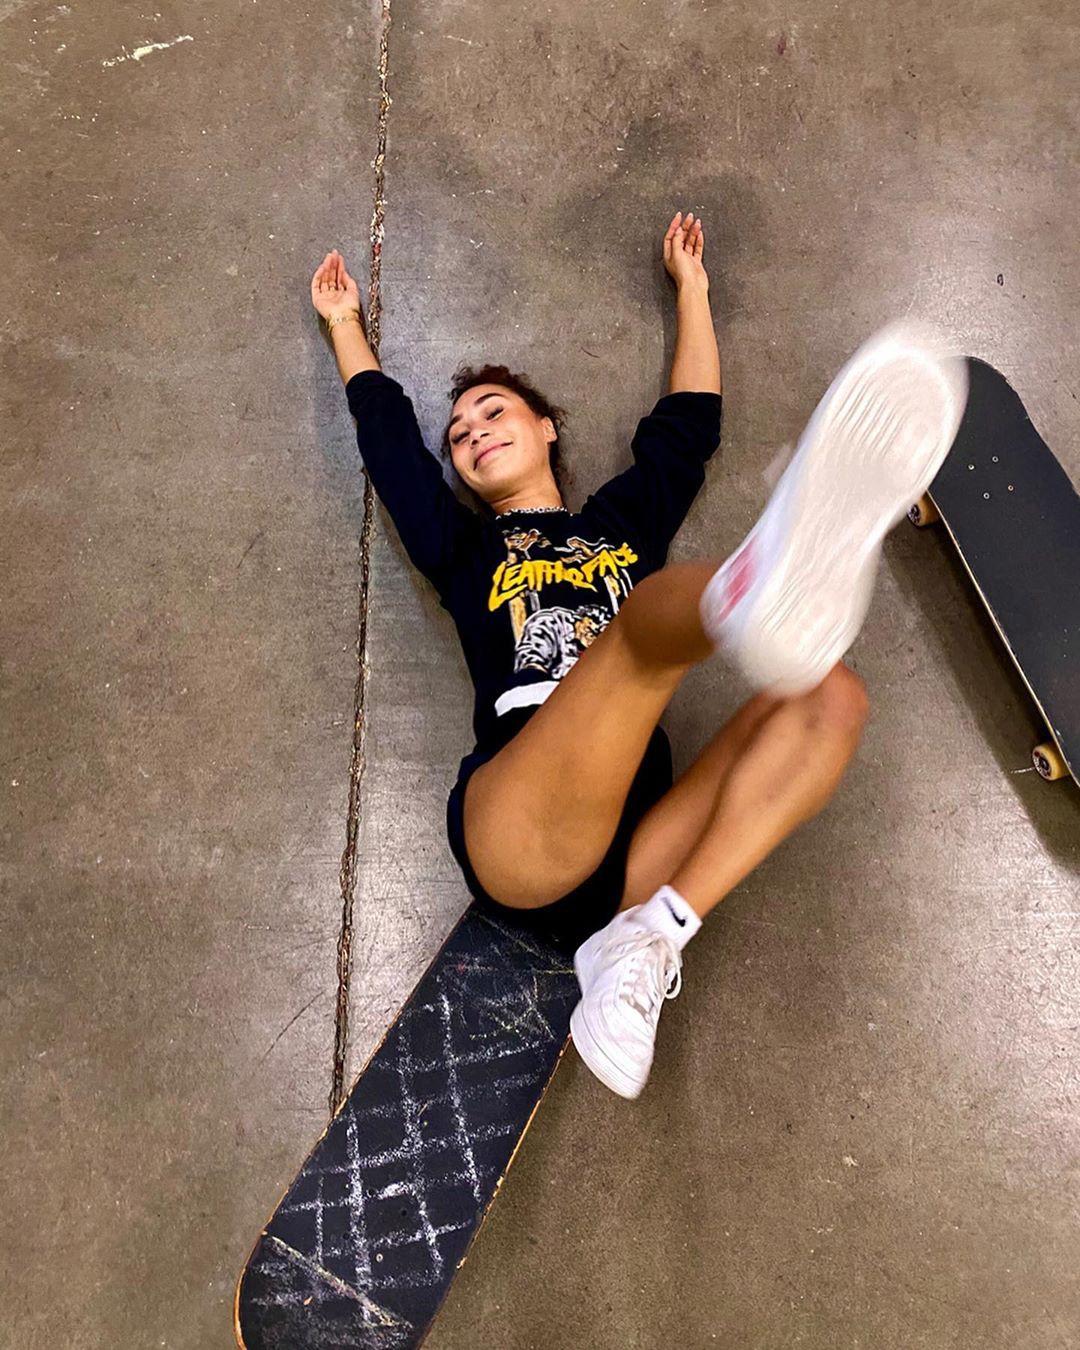 Eva Gutowski fine legs, outdoor fun, individual sports